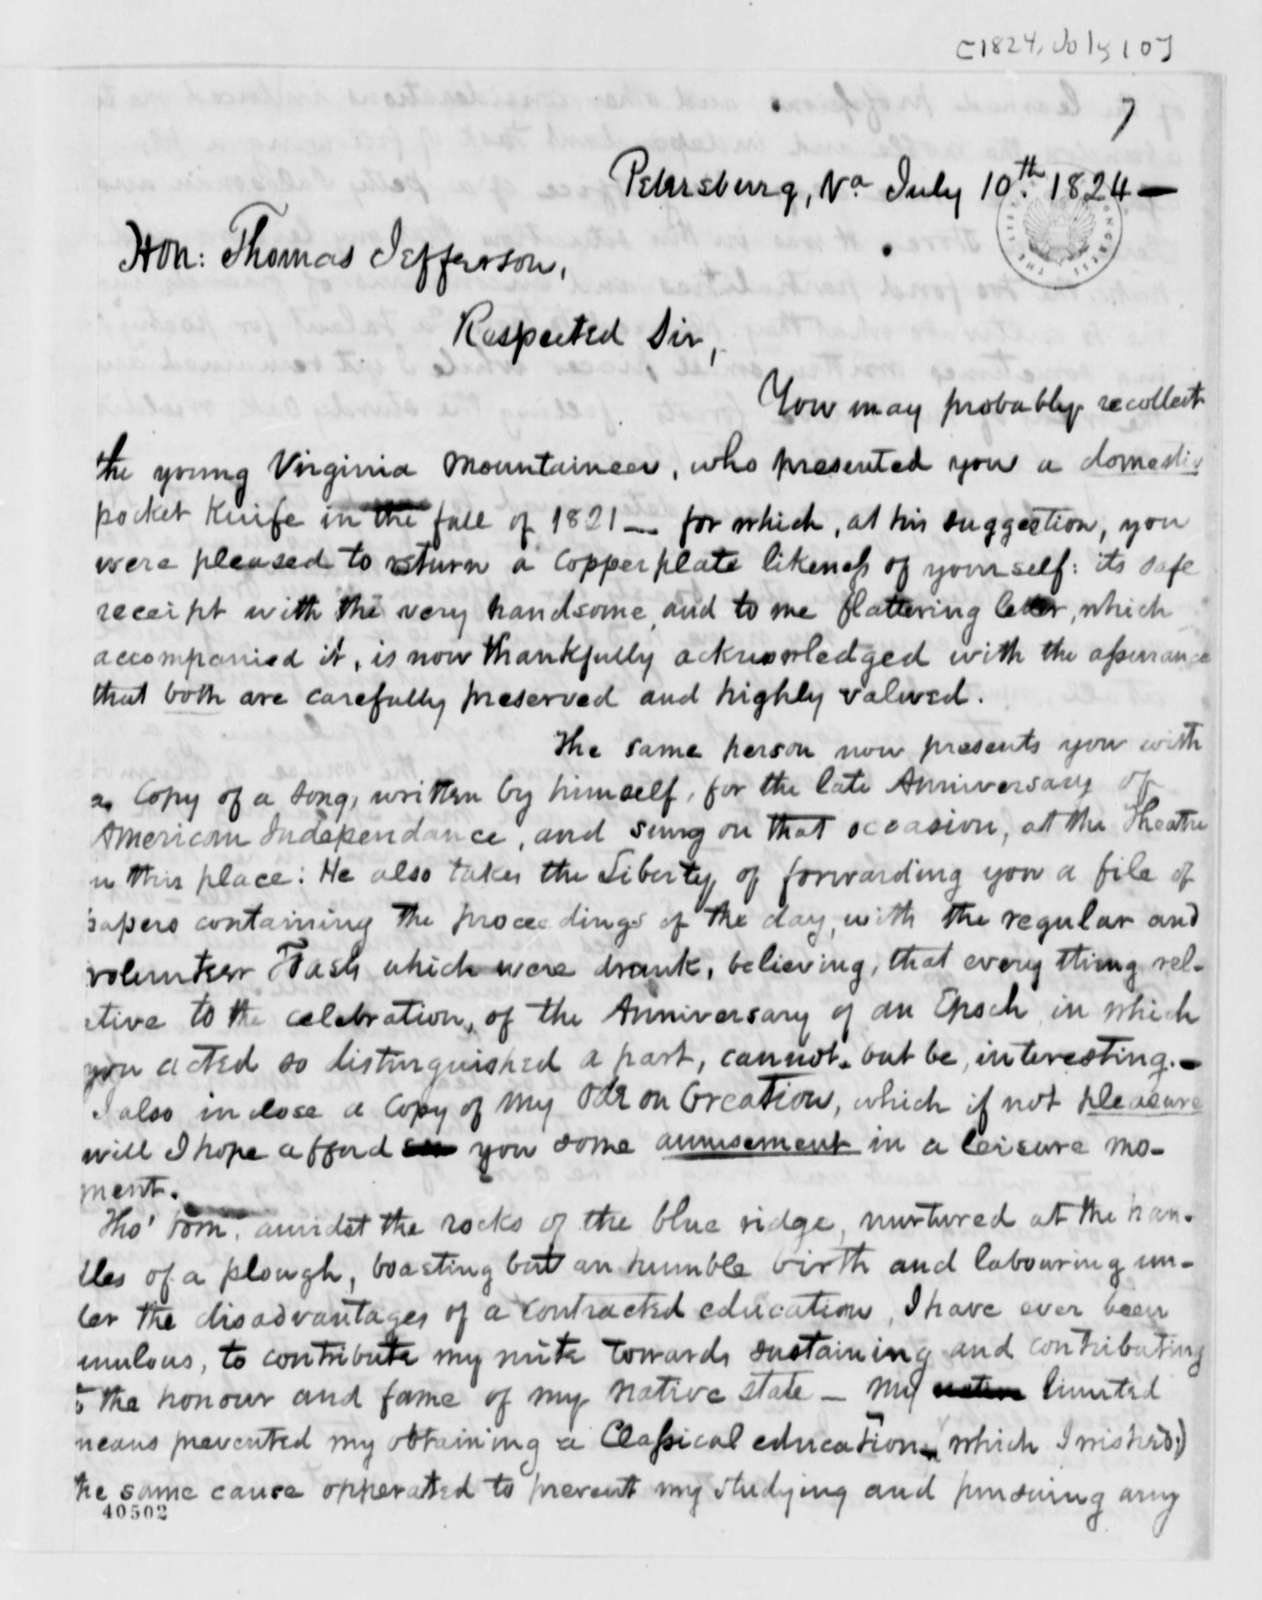 Hiram Haines to Thomas Jefferson, July 10, 1824